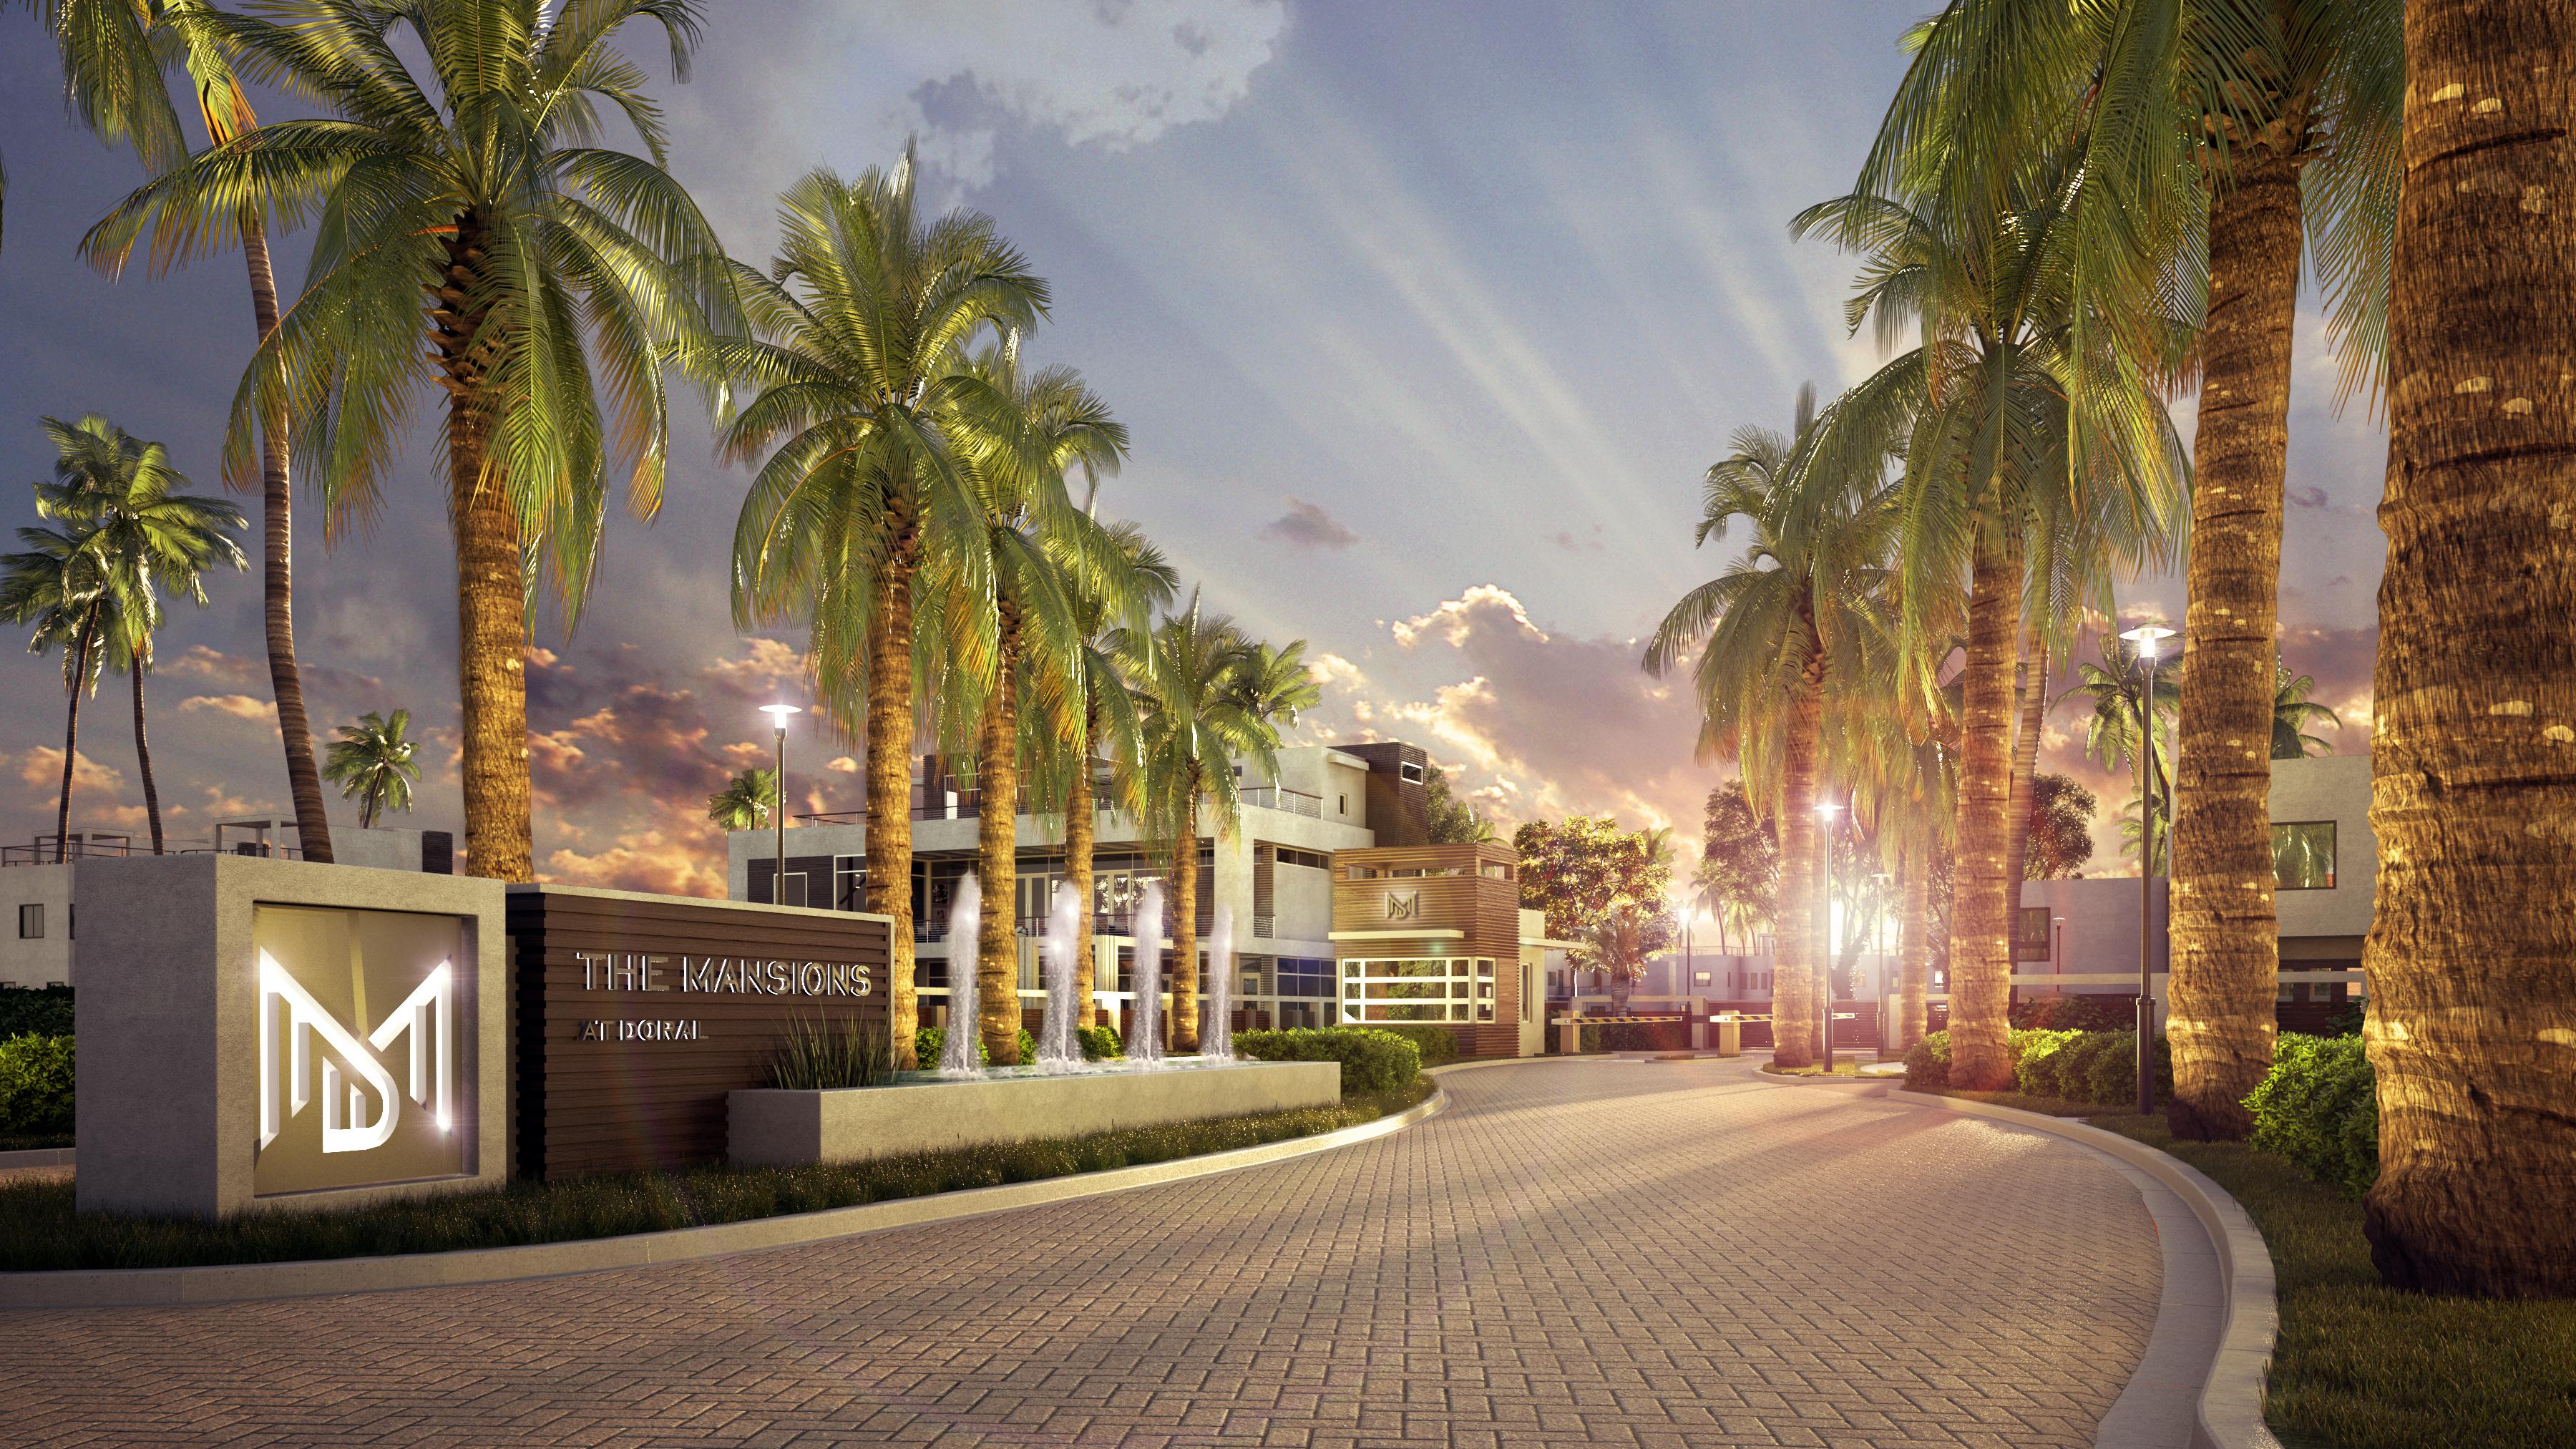 Moradia para Venda às Mansion III 6805 Nw 107th Av Doral, Florida, 33178 Estados Unidos